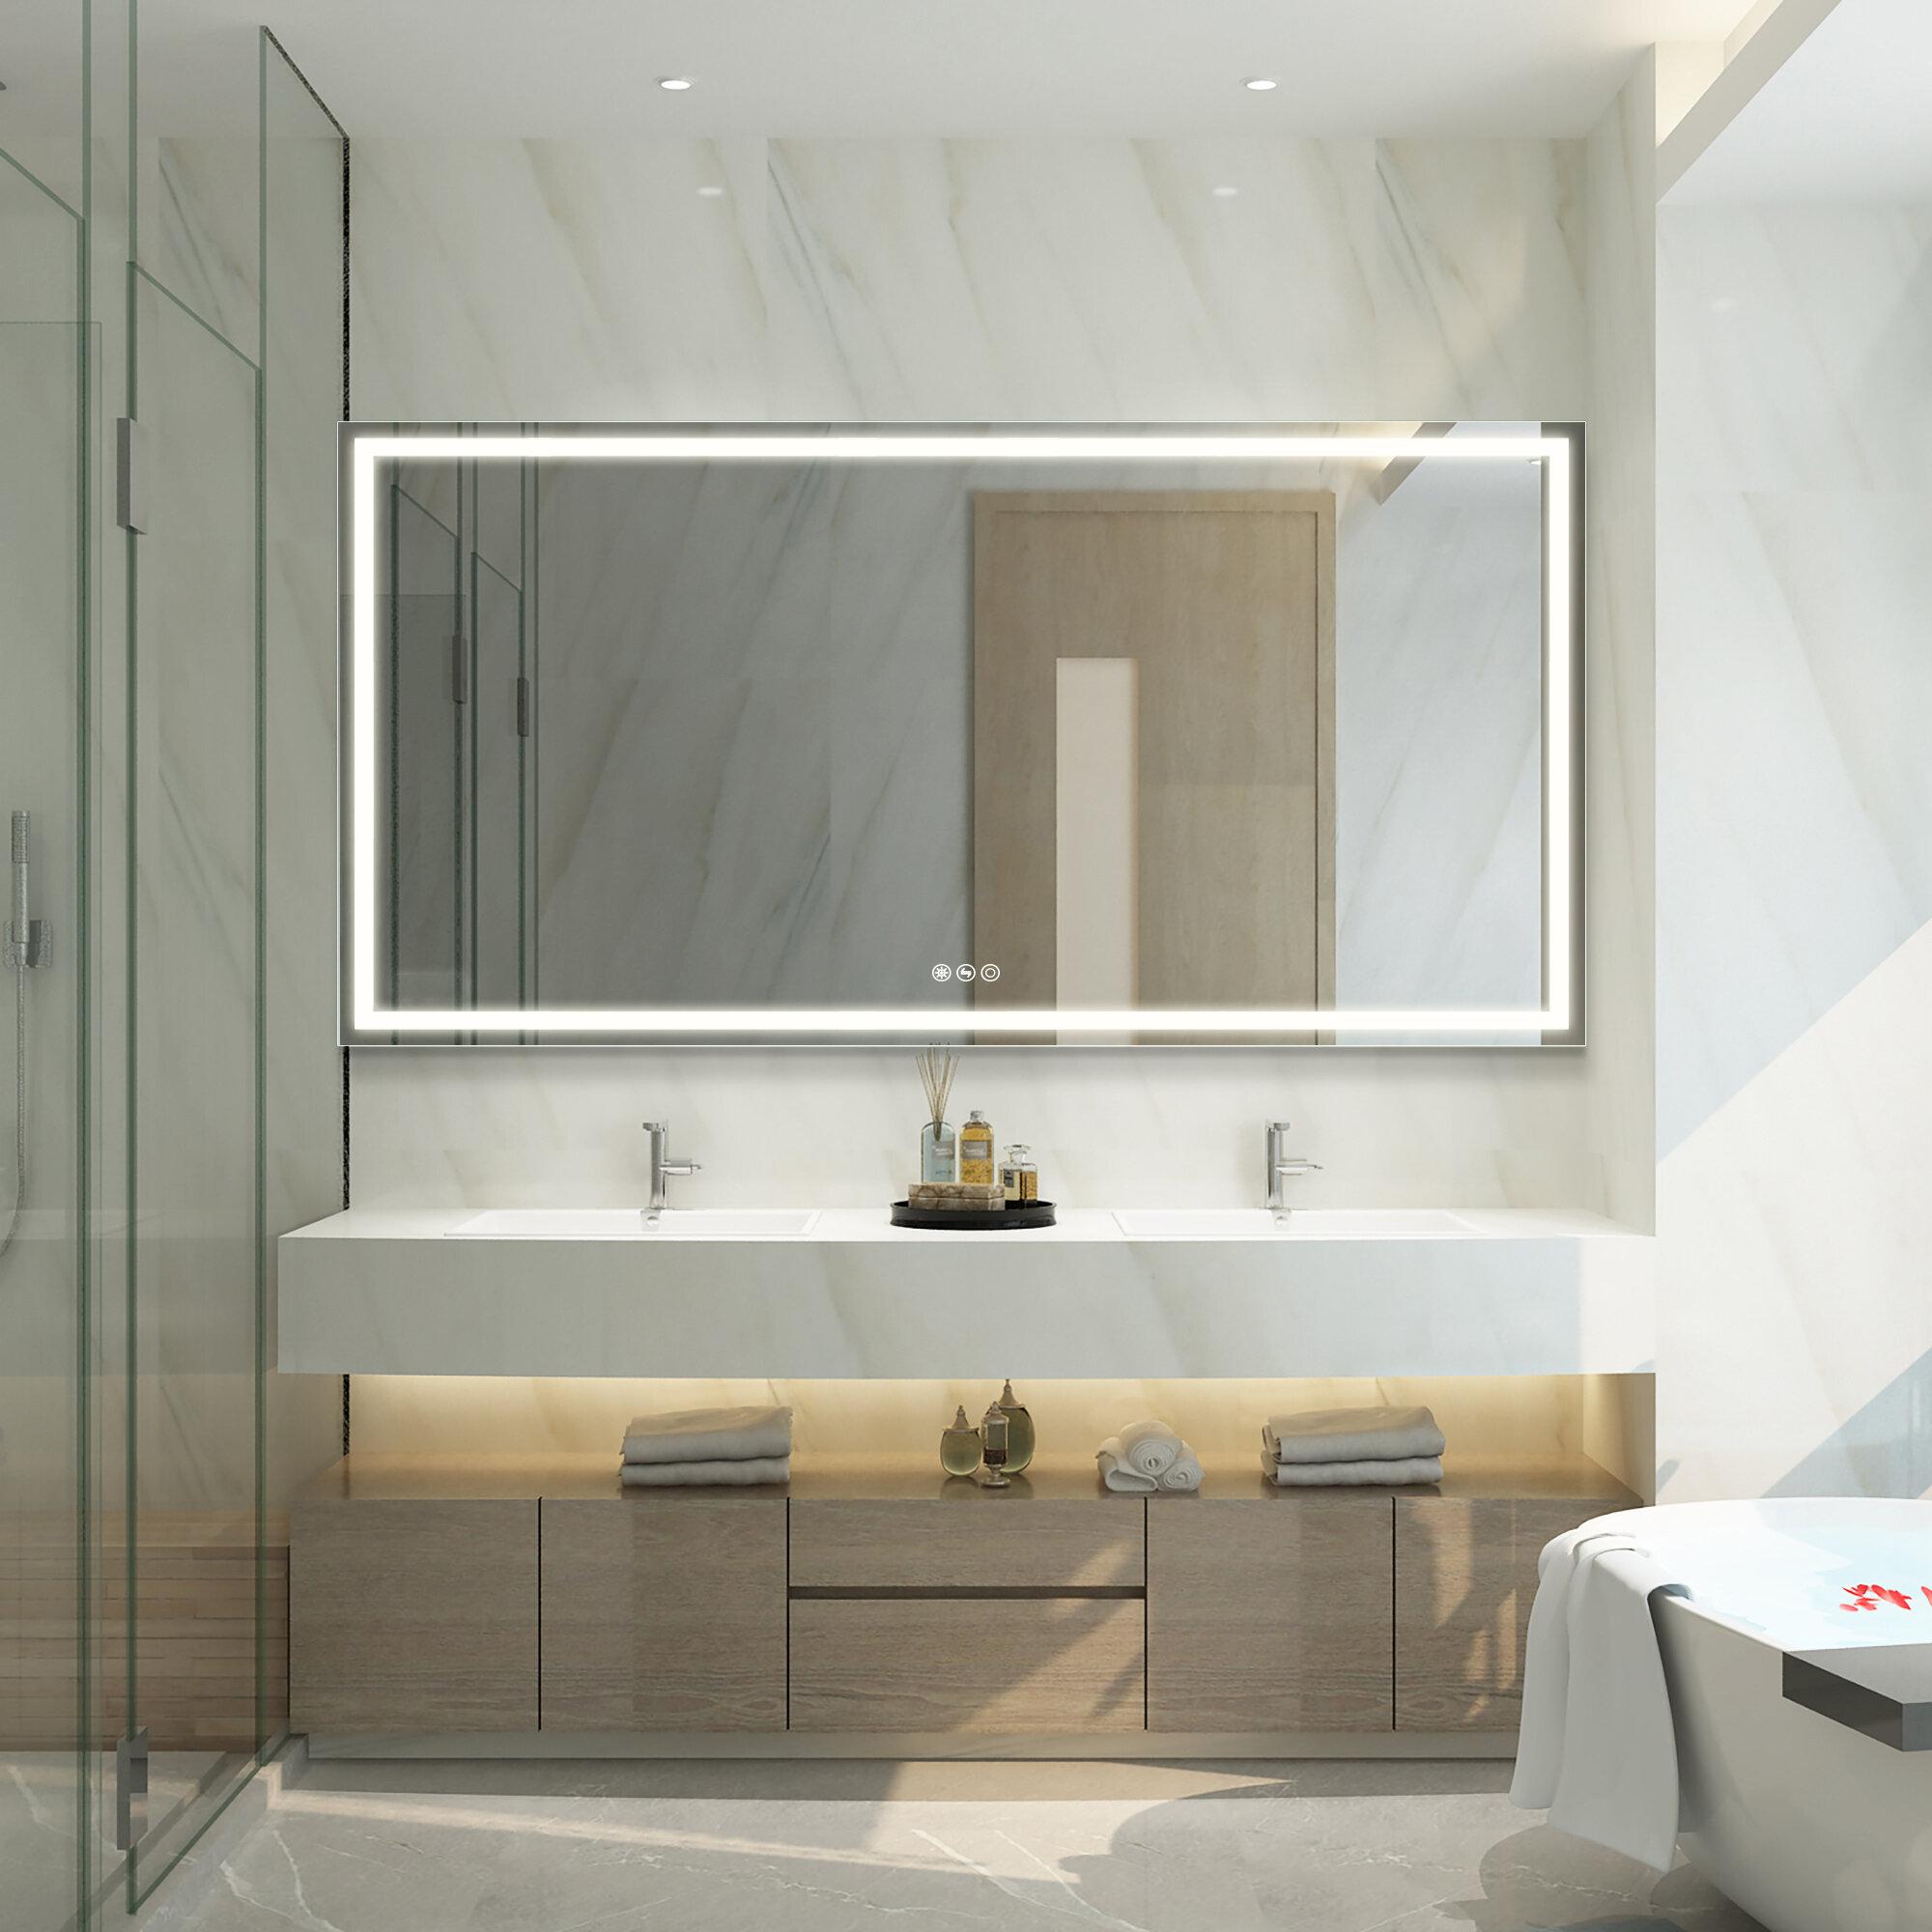 Boyel Living Modern Led Lighted Bathroom Mirror Wayfair